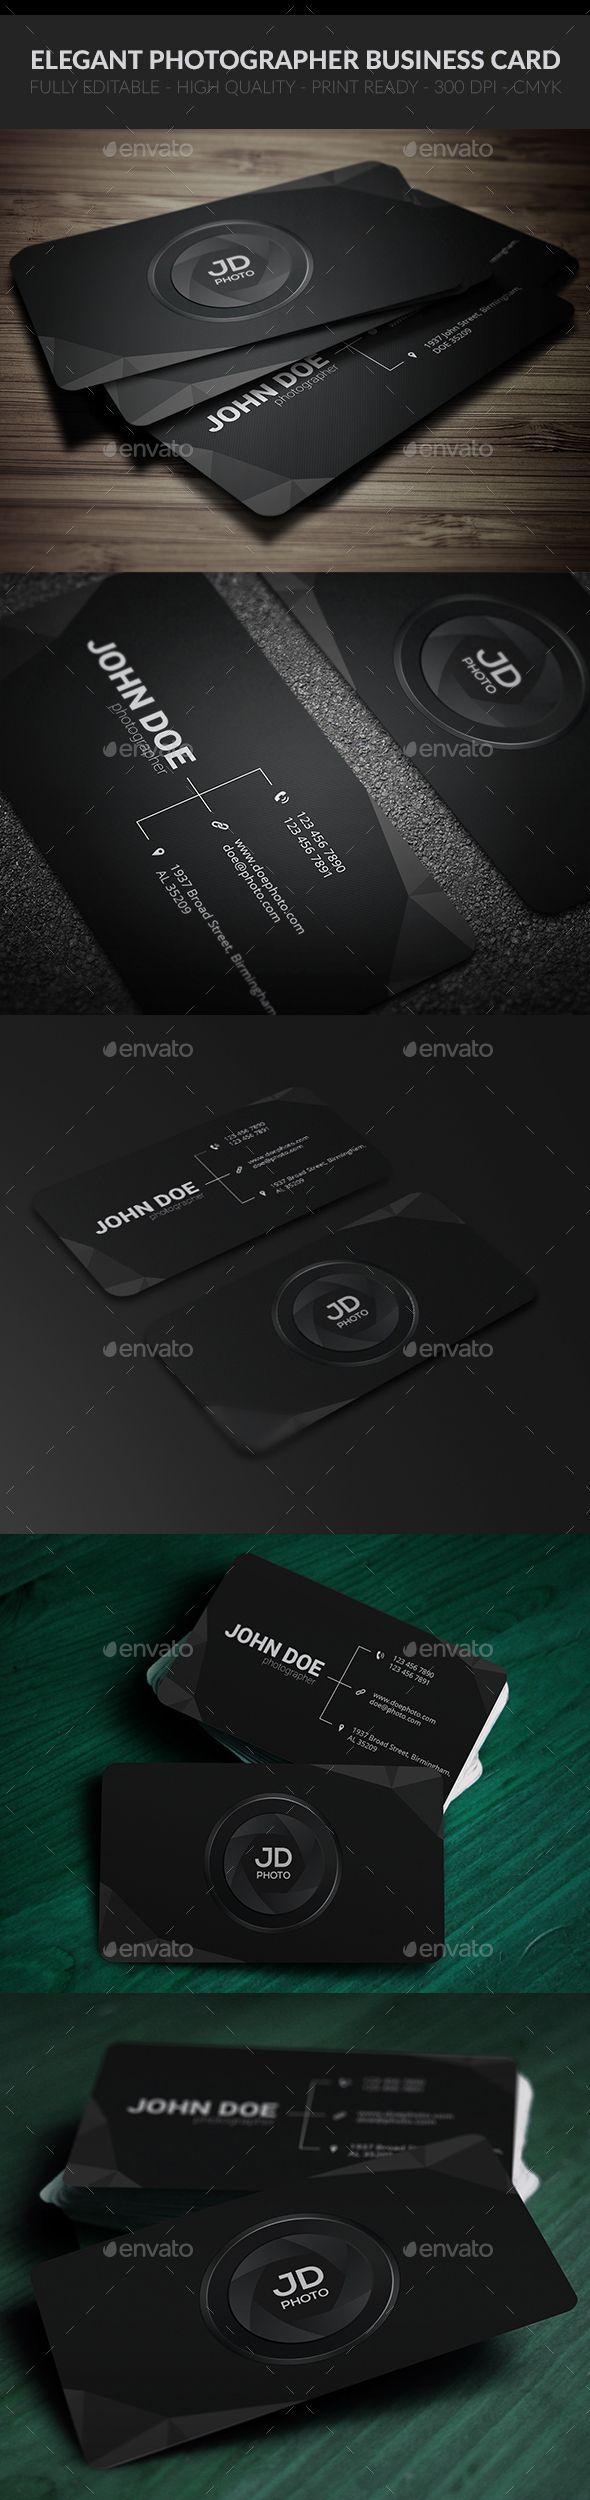 Elegant Photographer Business Card  —  PSD Template